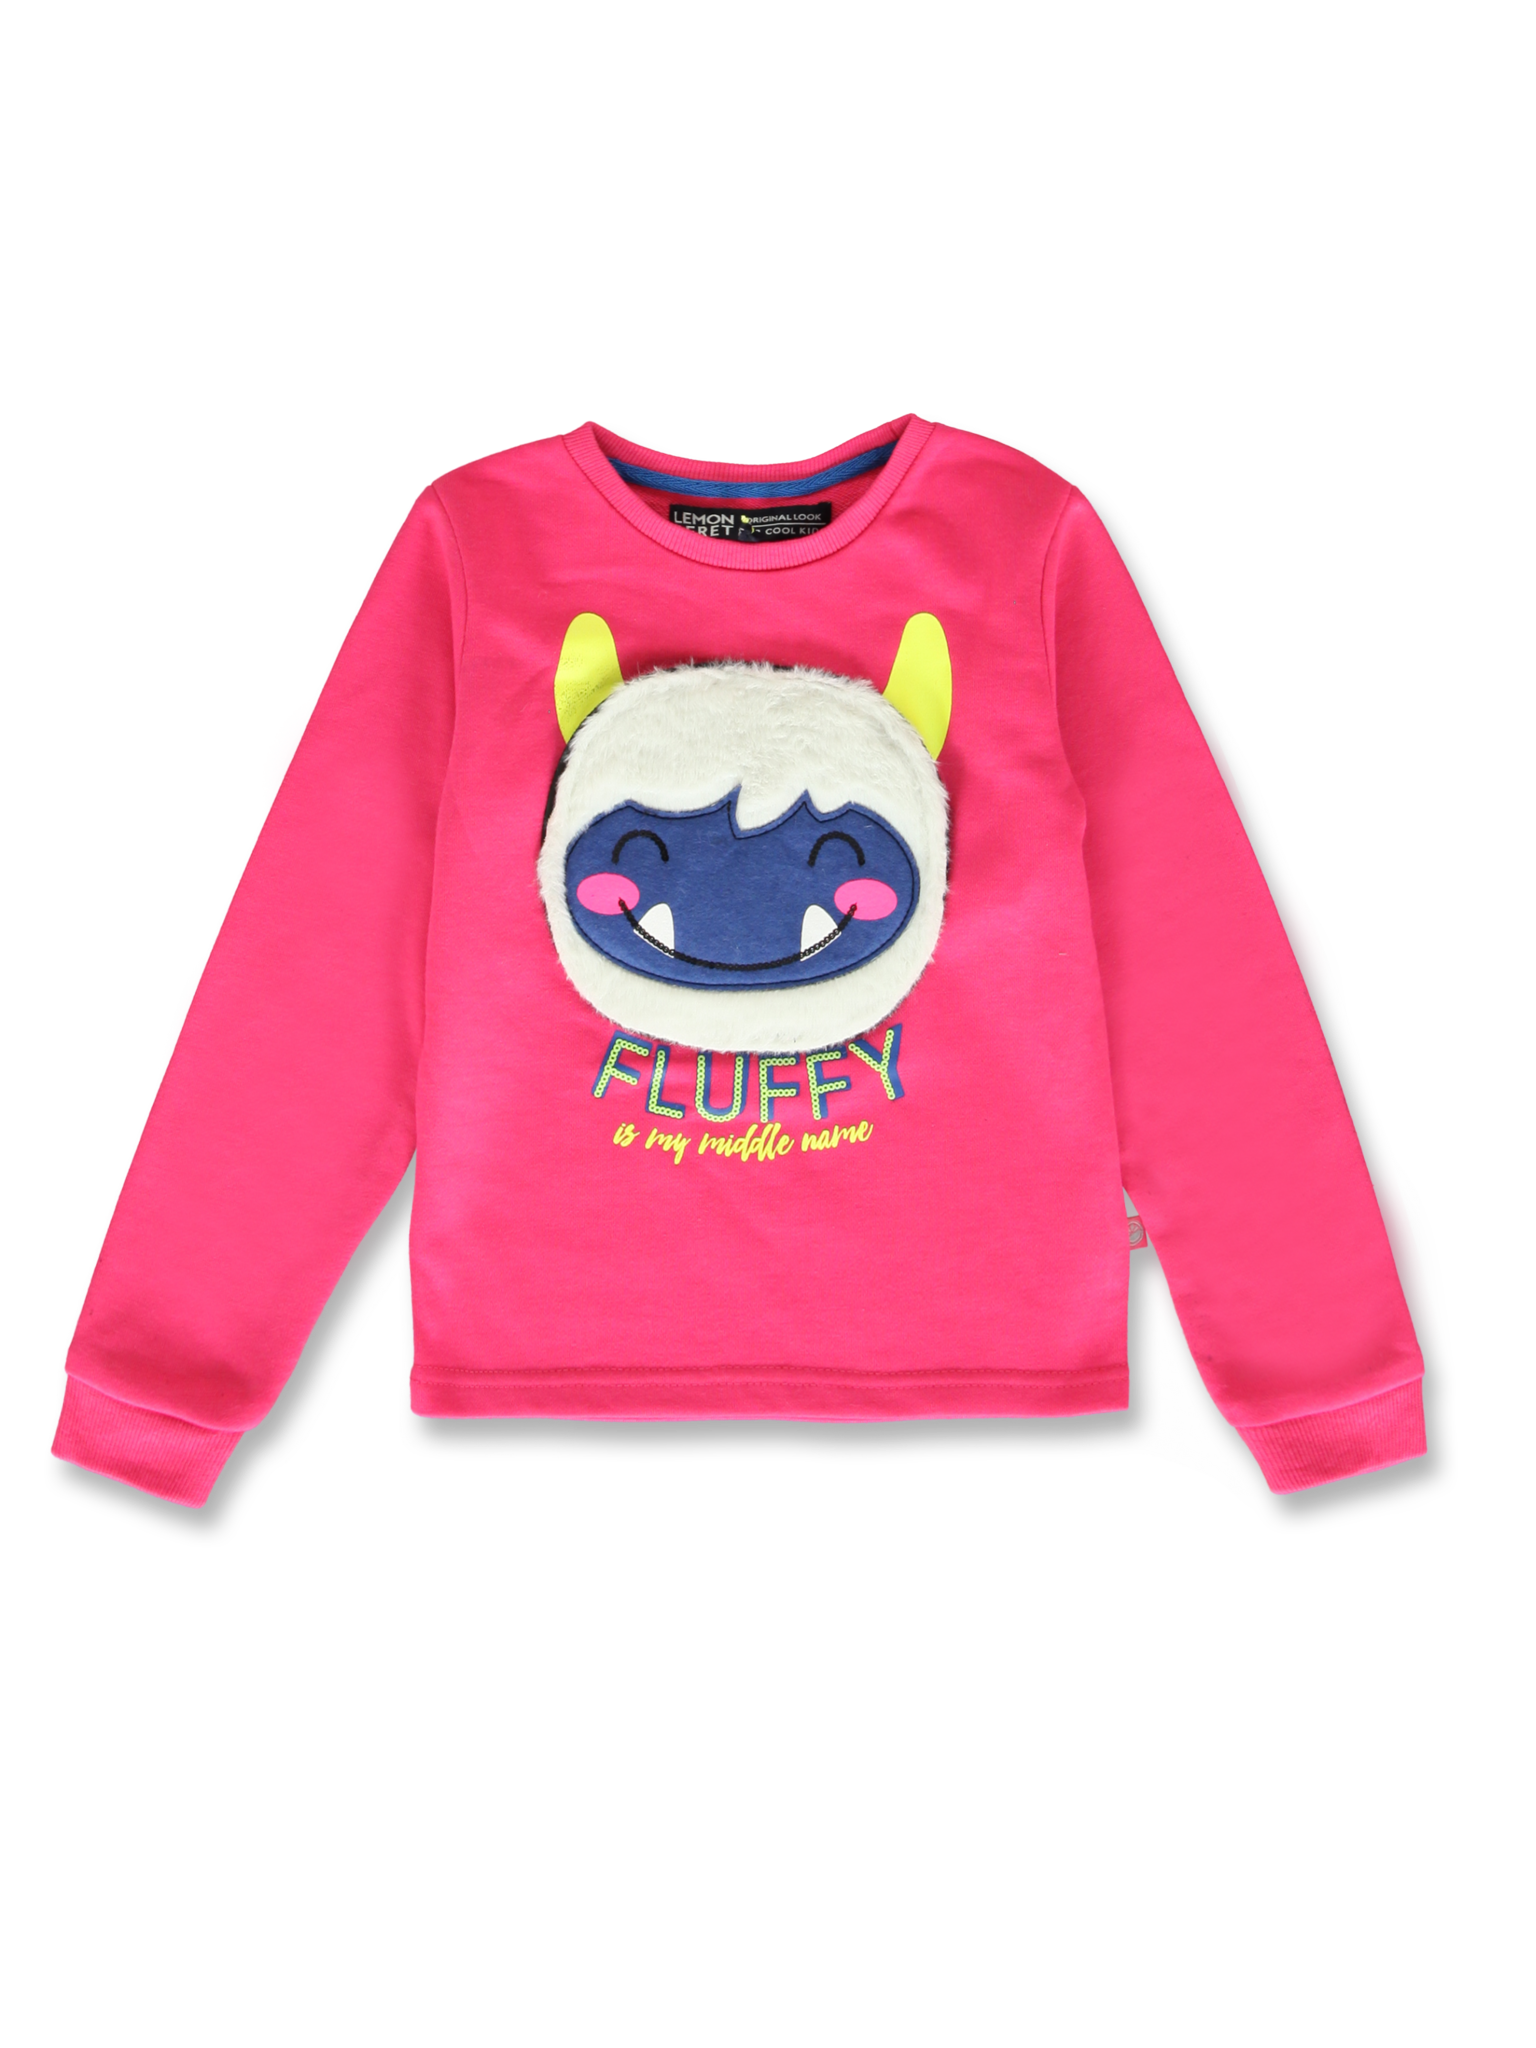 All Brands | Winterproducts Small Girls | Sweatshirt | 12 pcs/box